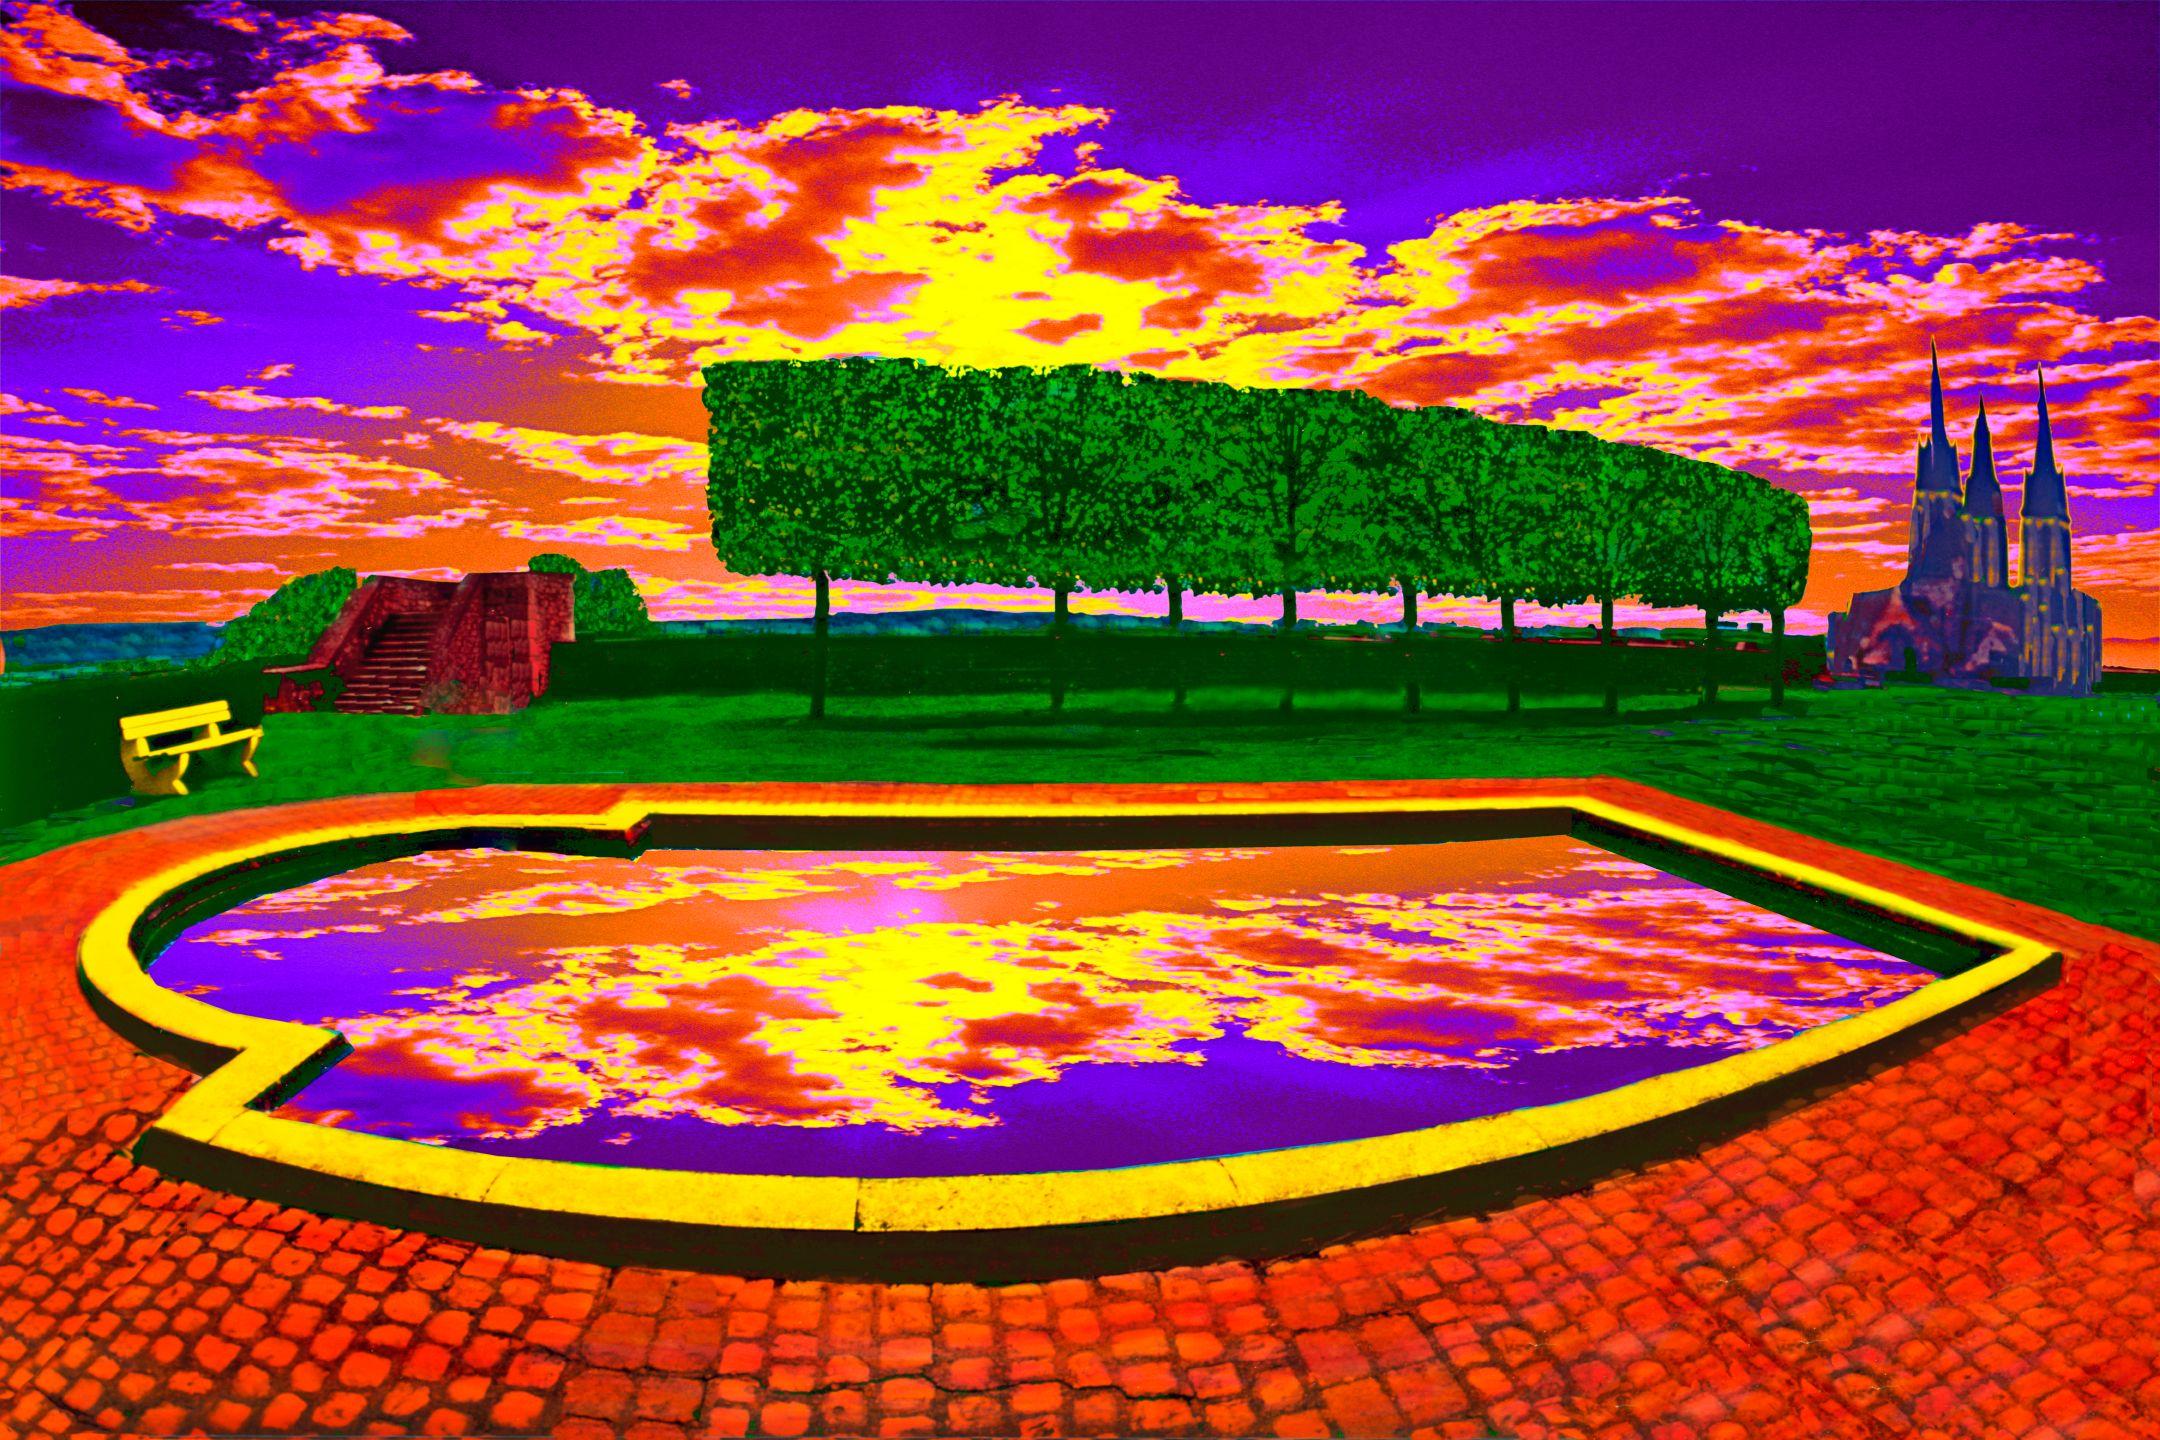 Gottlieb-Jane-Chartres Pond lg.jpg